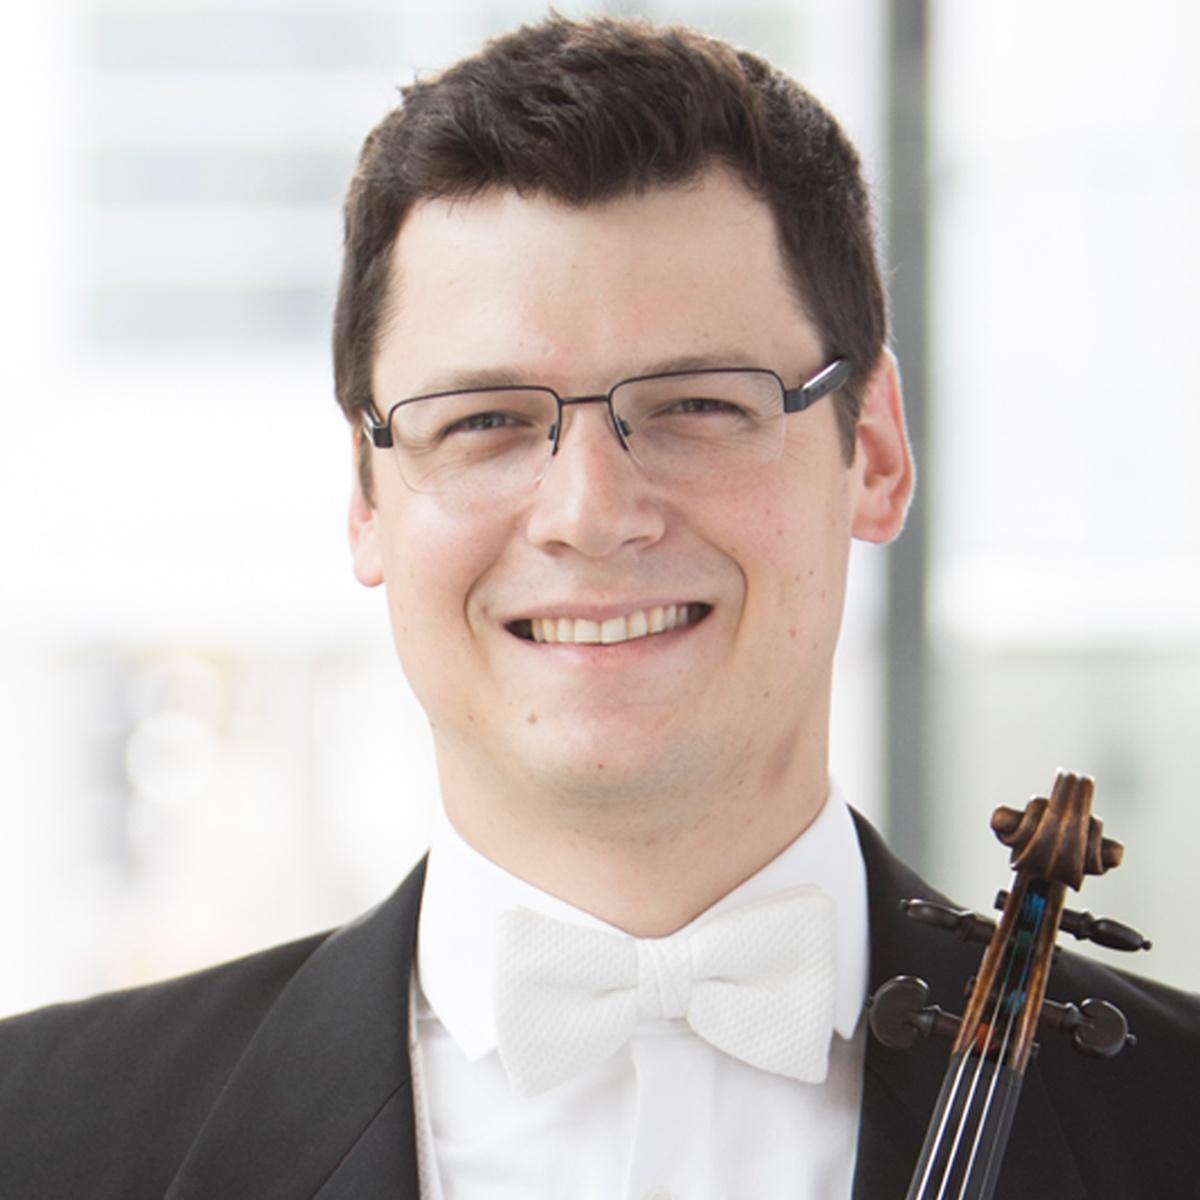 Ben Odhner - ViolinMinnesota Orchestra